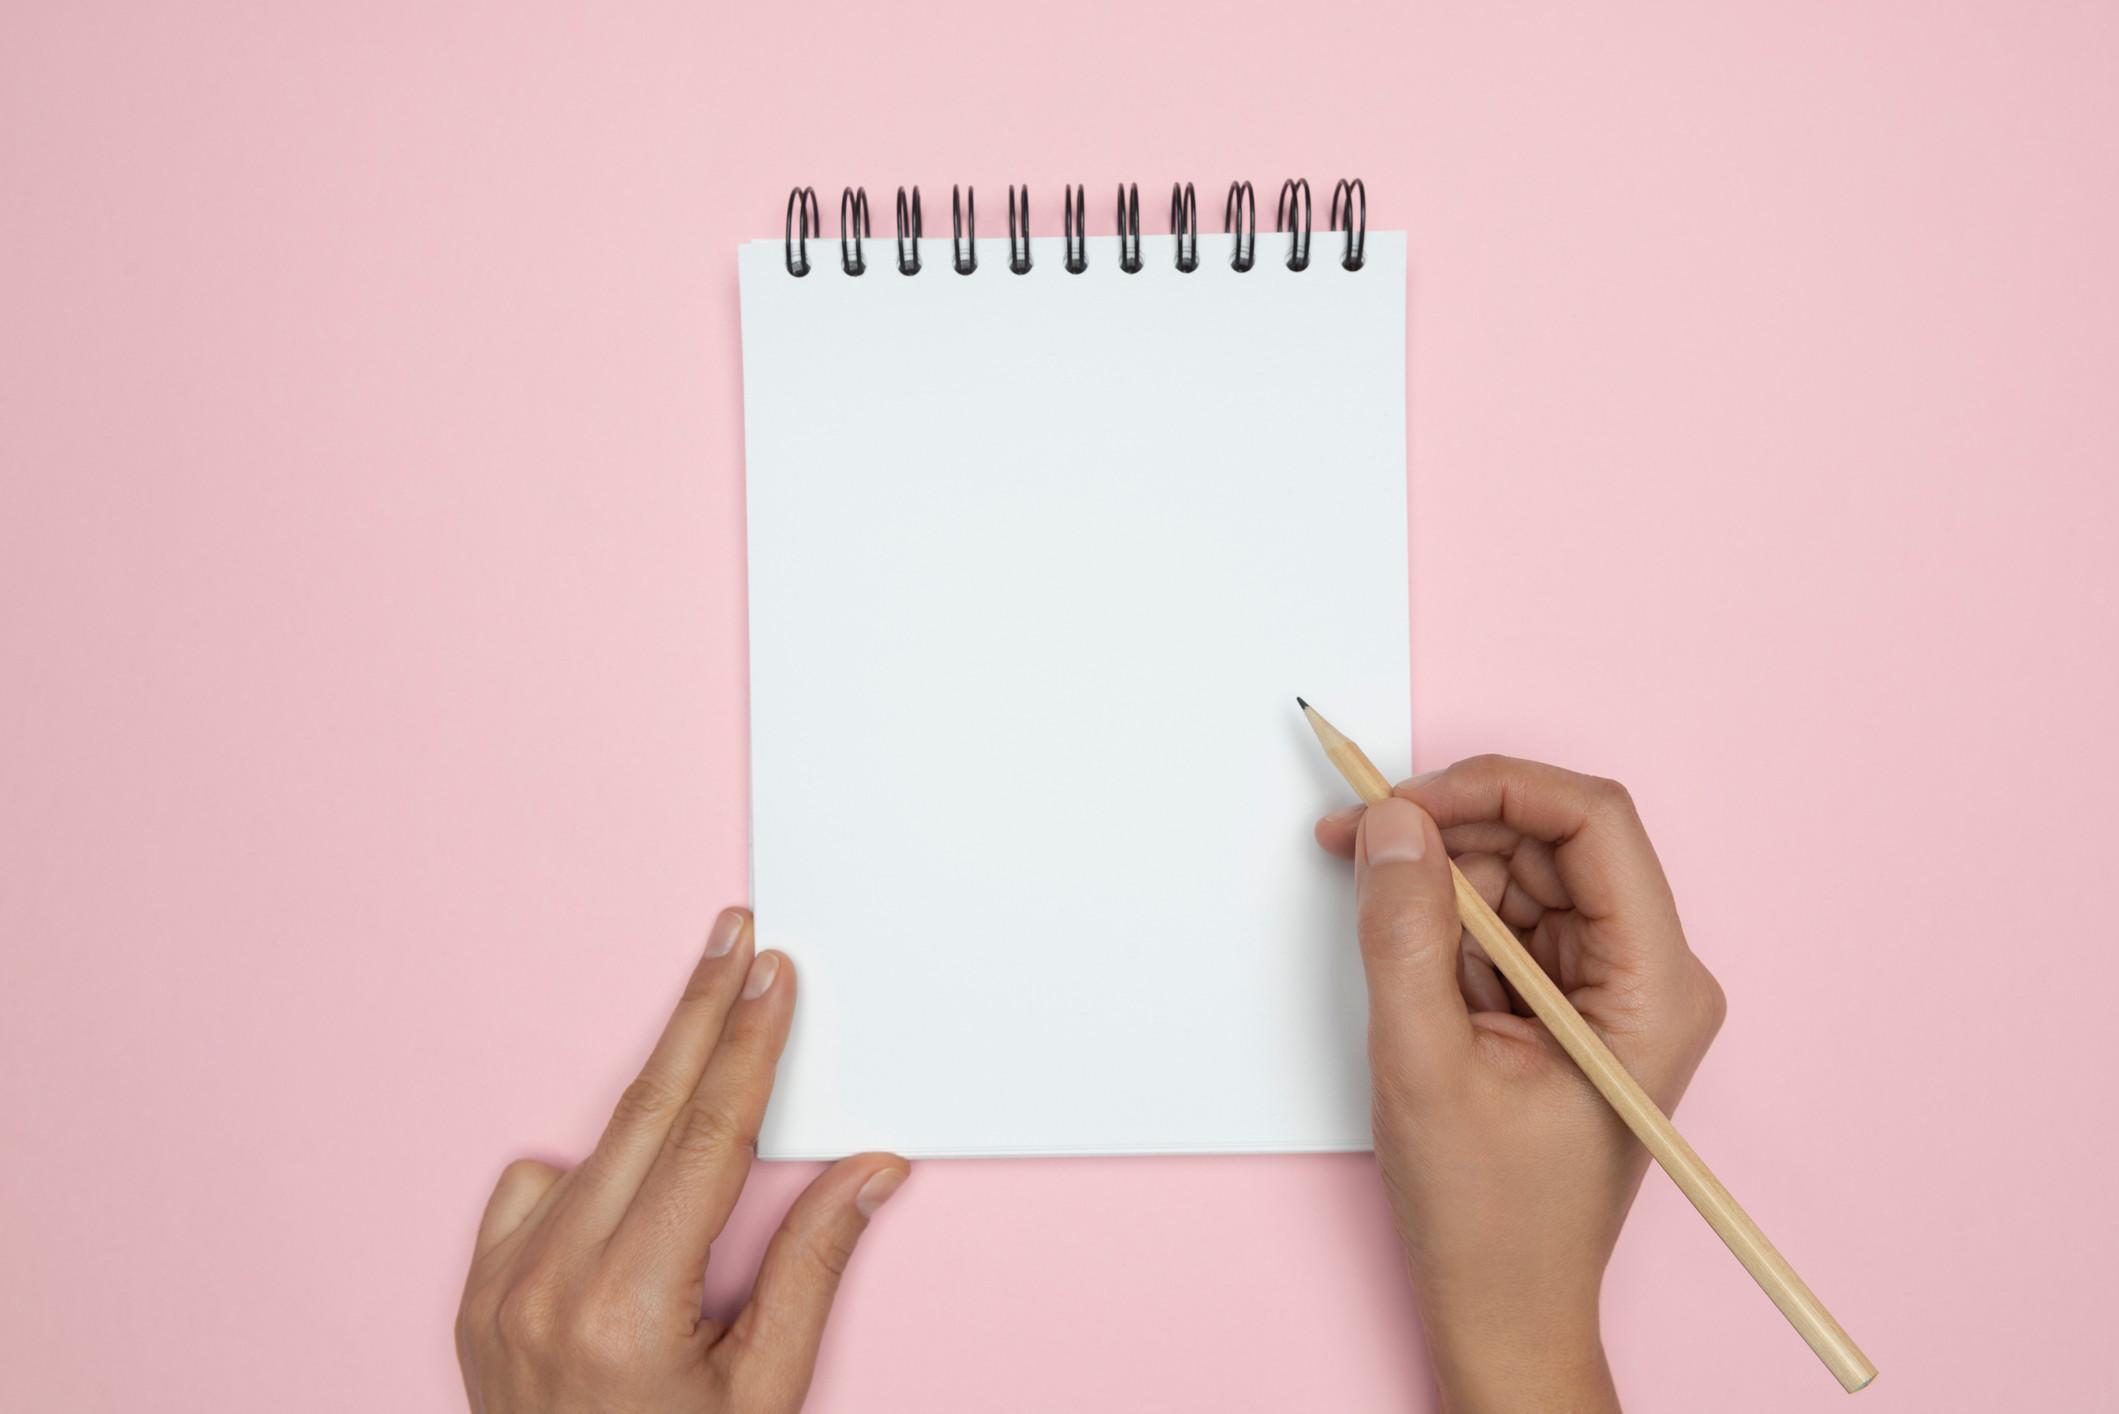 Creative Writing for beginners